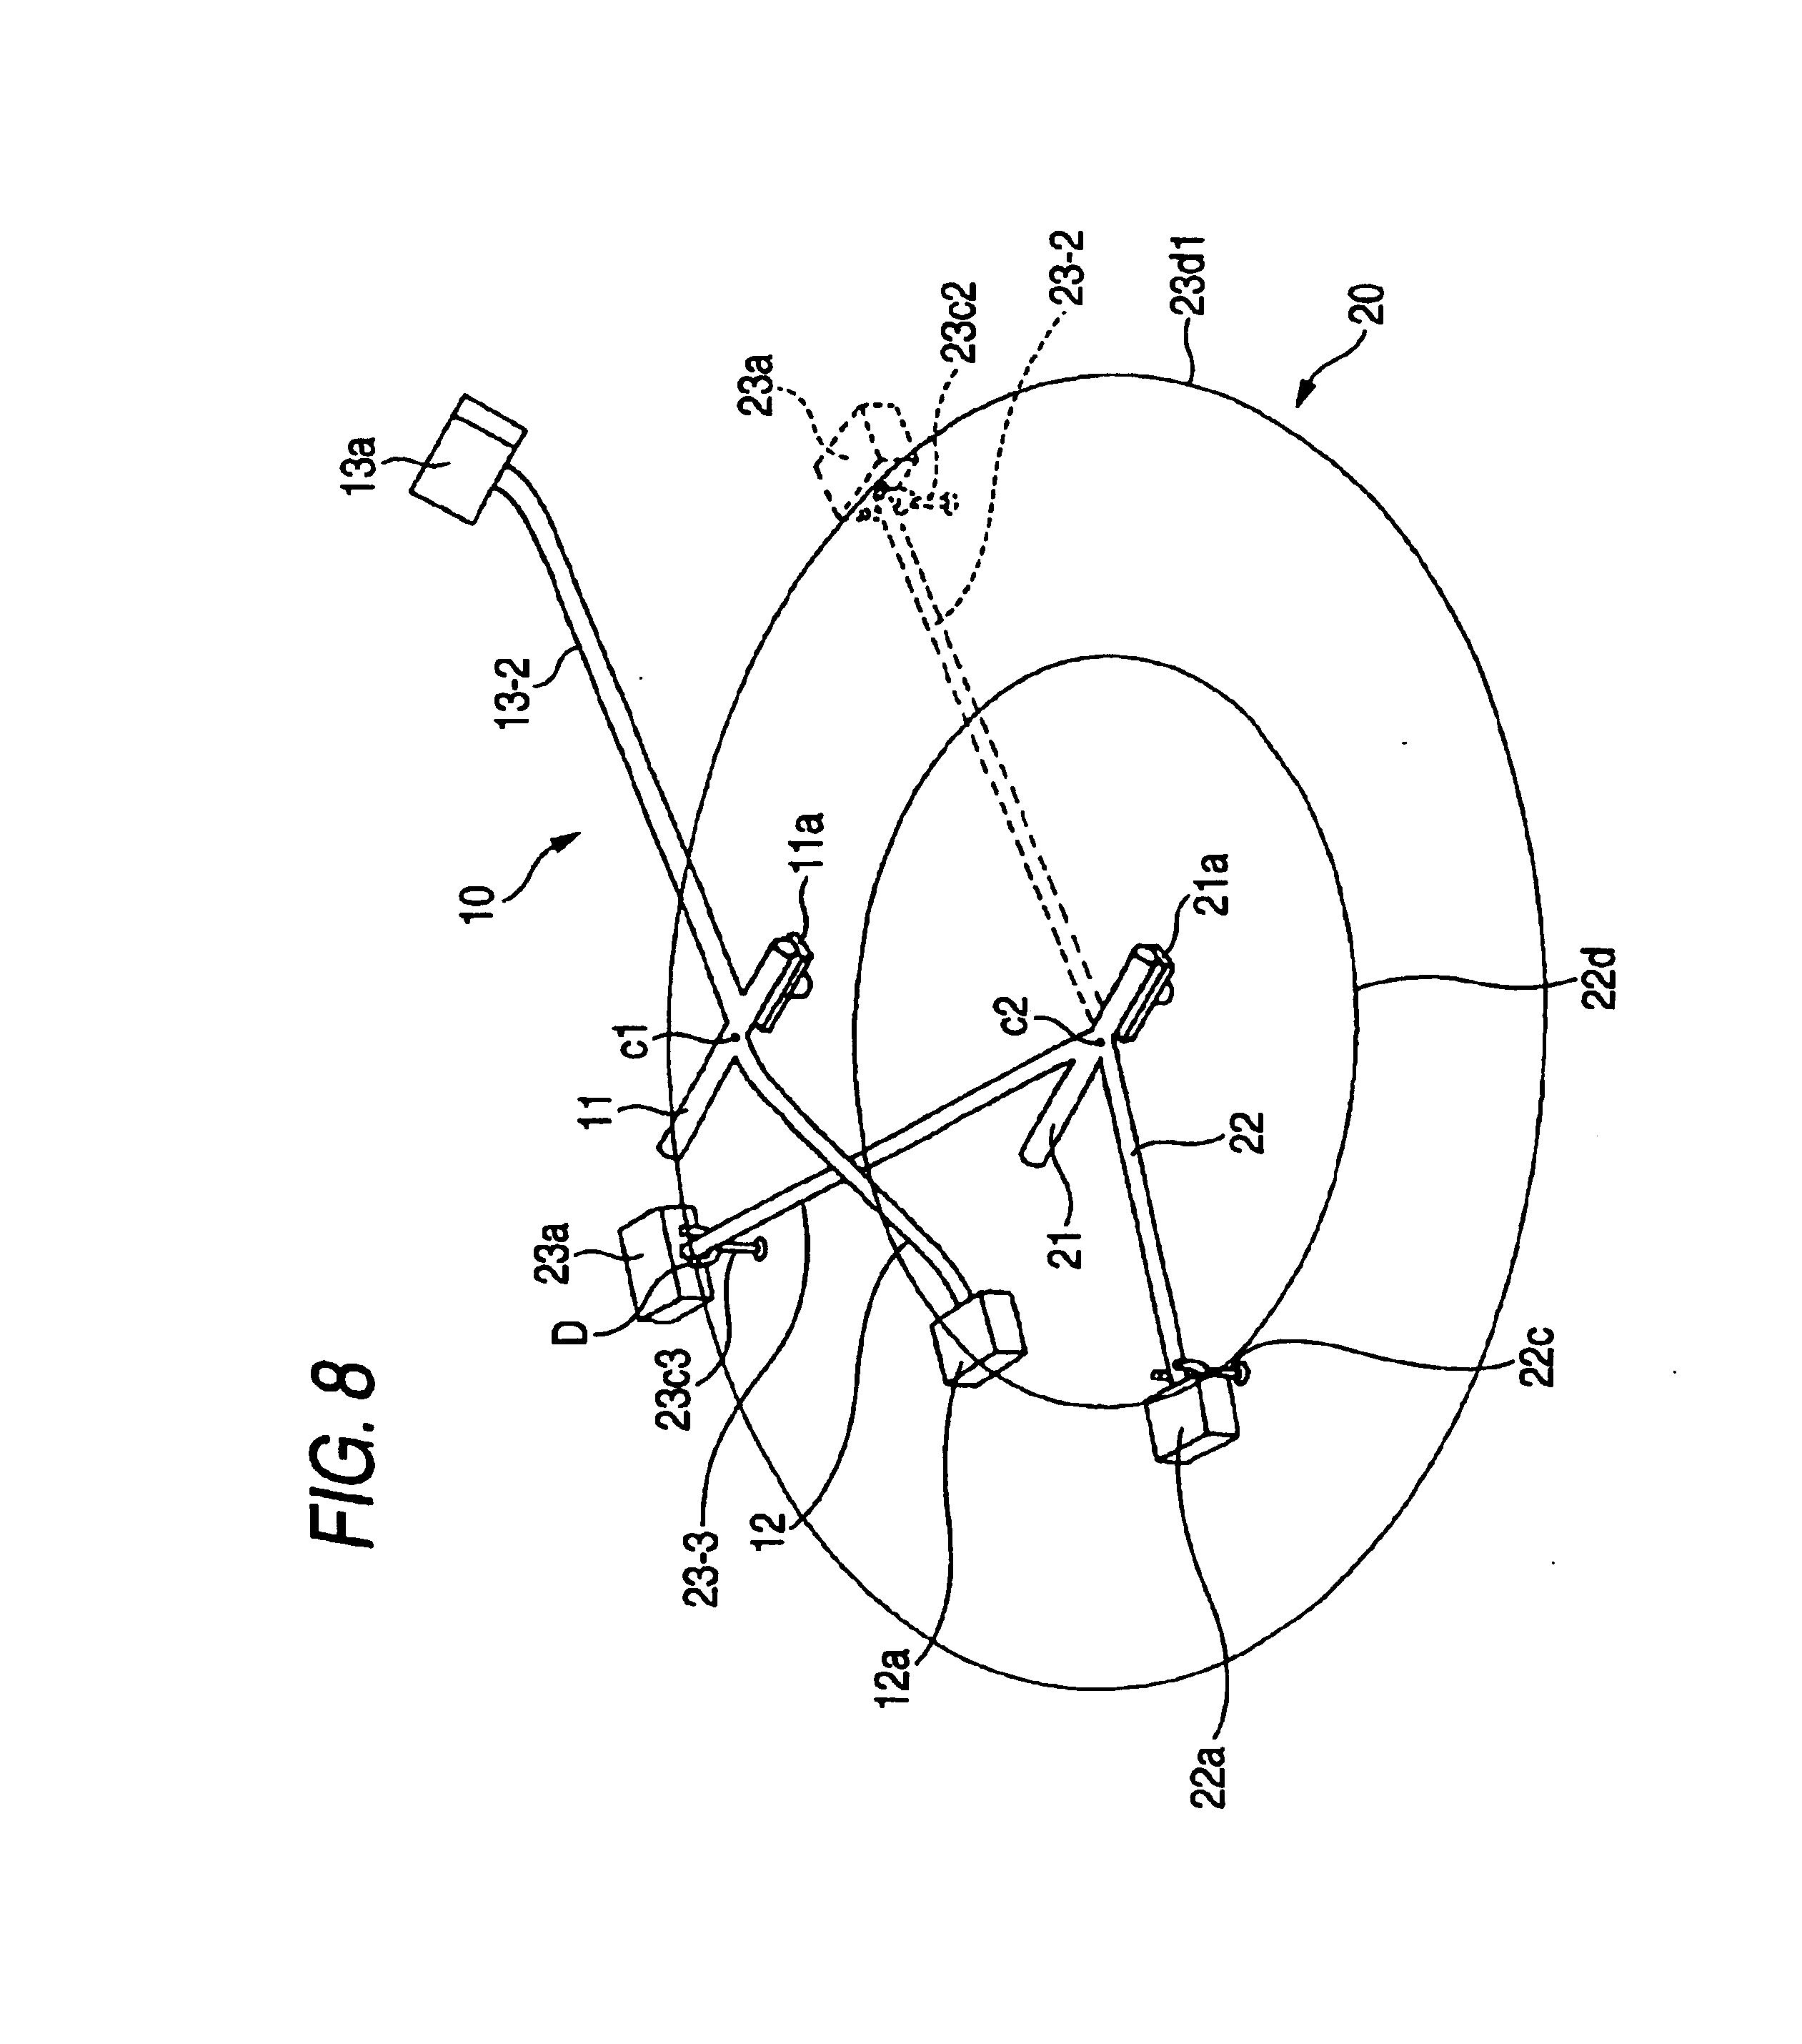 sound off signal wiring diagrams imageresizertool com clifford alarm wiring diagrams alarm wiring diagrams